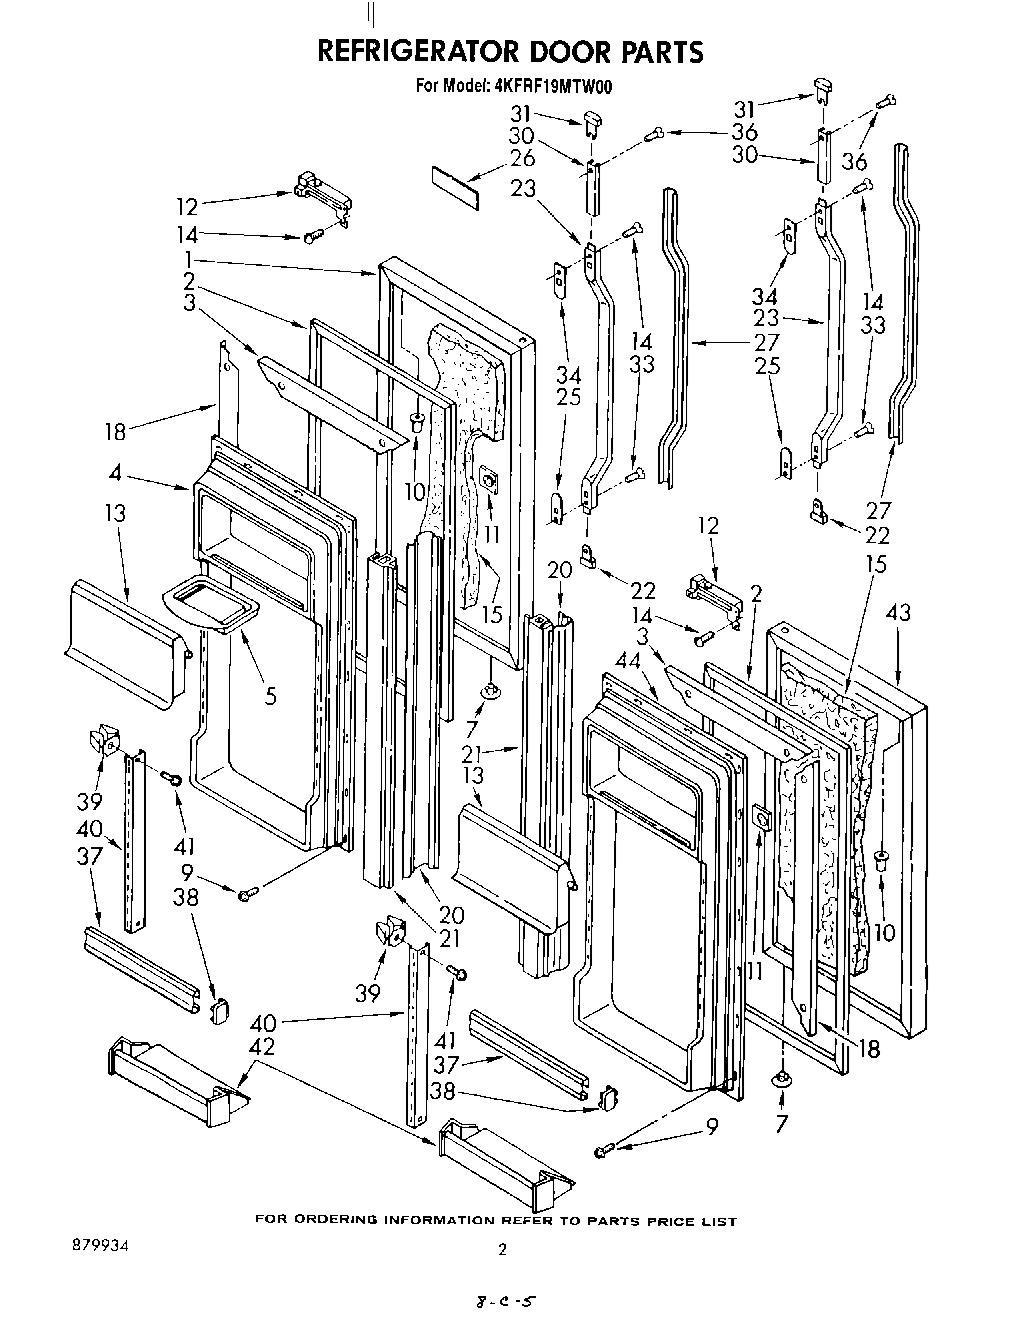 Refrigerator Compressor Relay 1108143 Wiring Diagrams - Wiring Circuit •